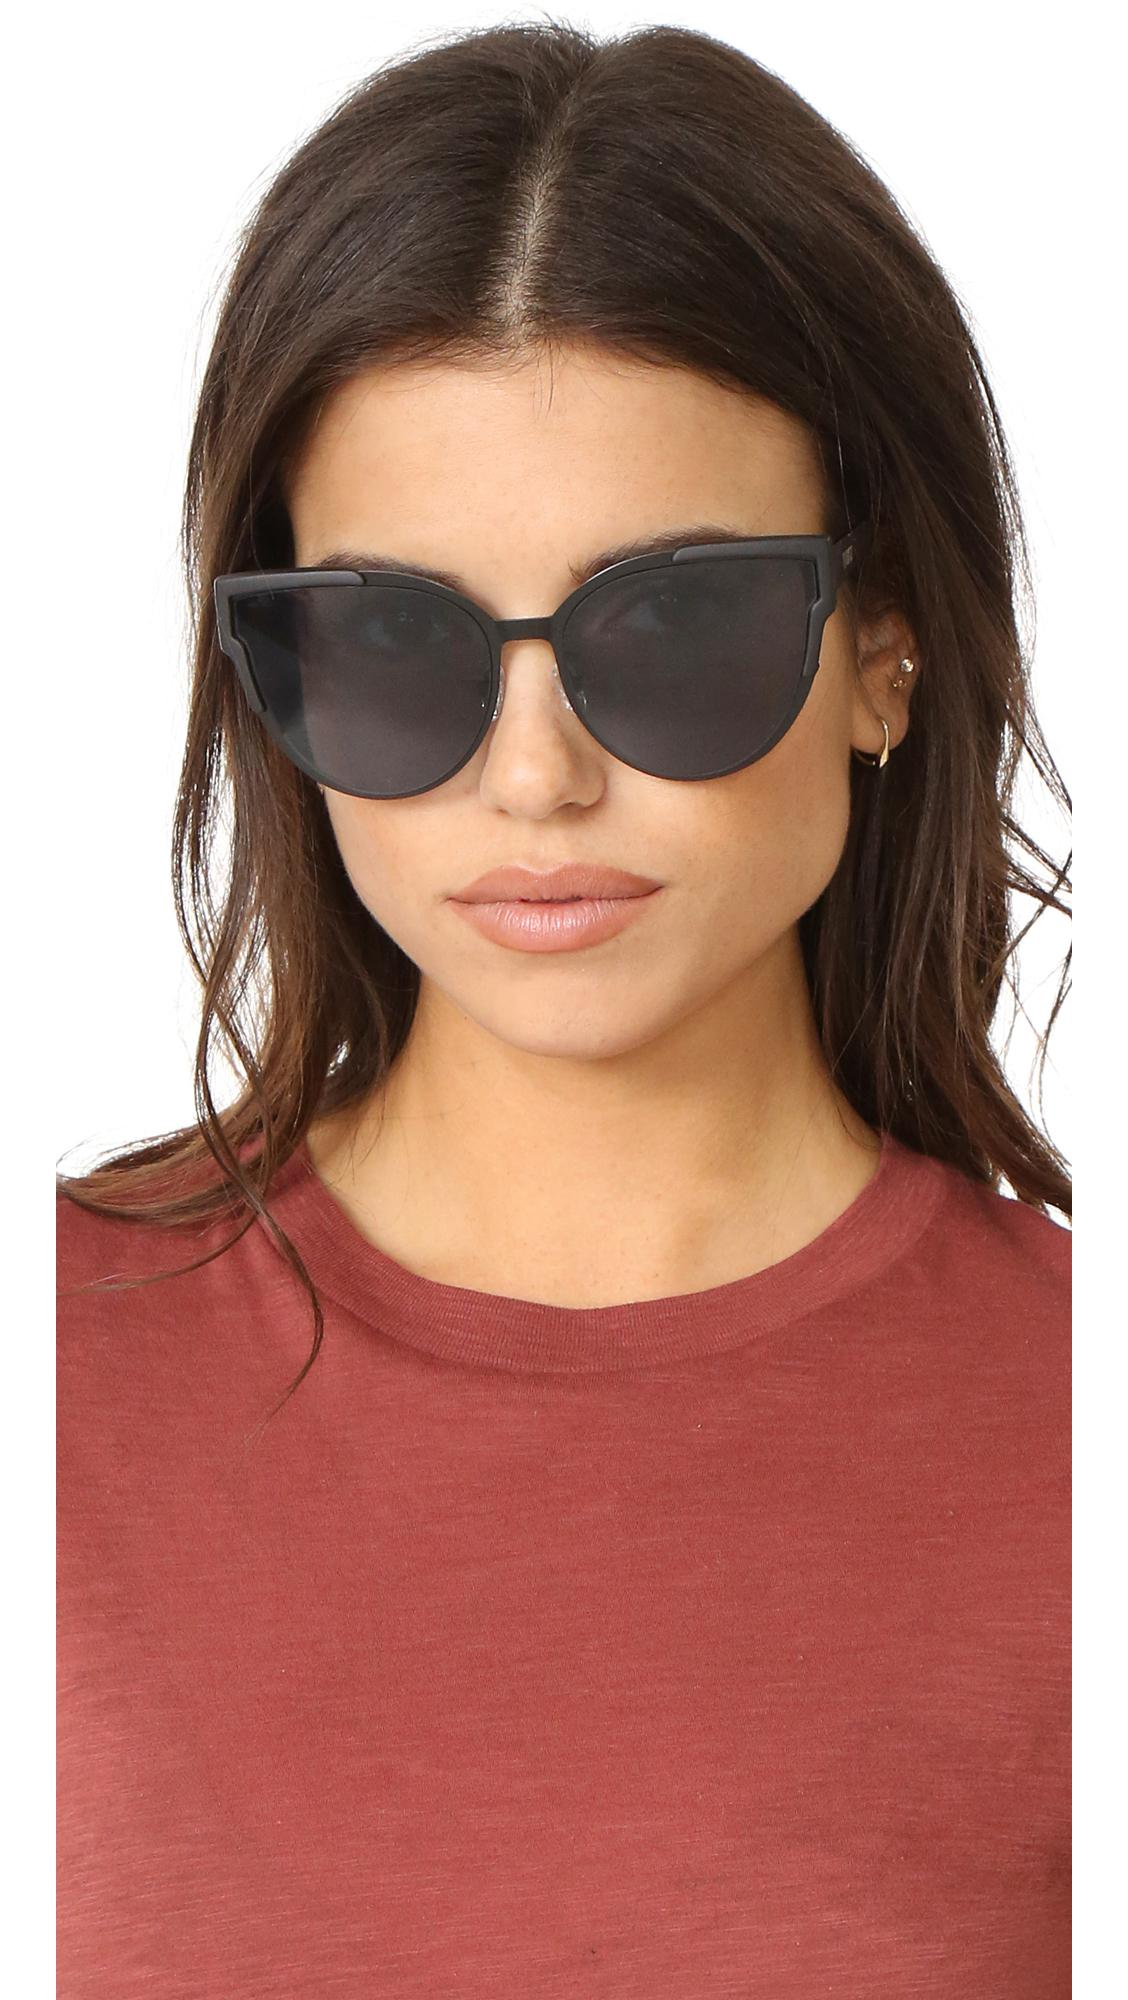 Quay Game On Sunglasses in Black/Smoke (Black)